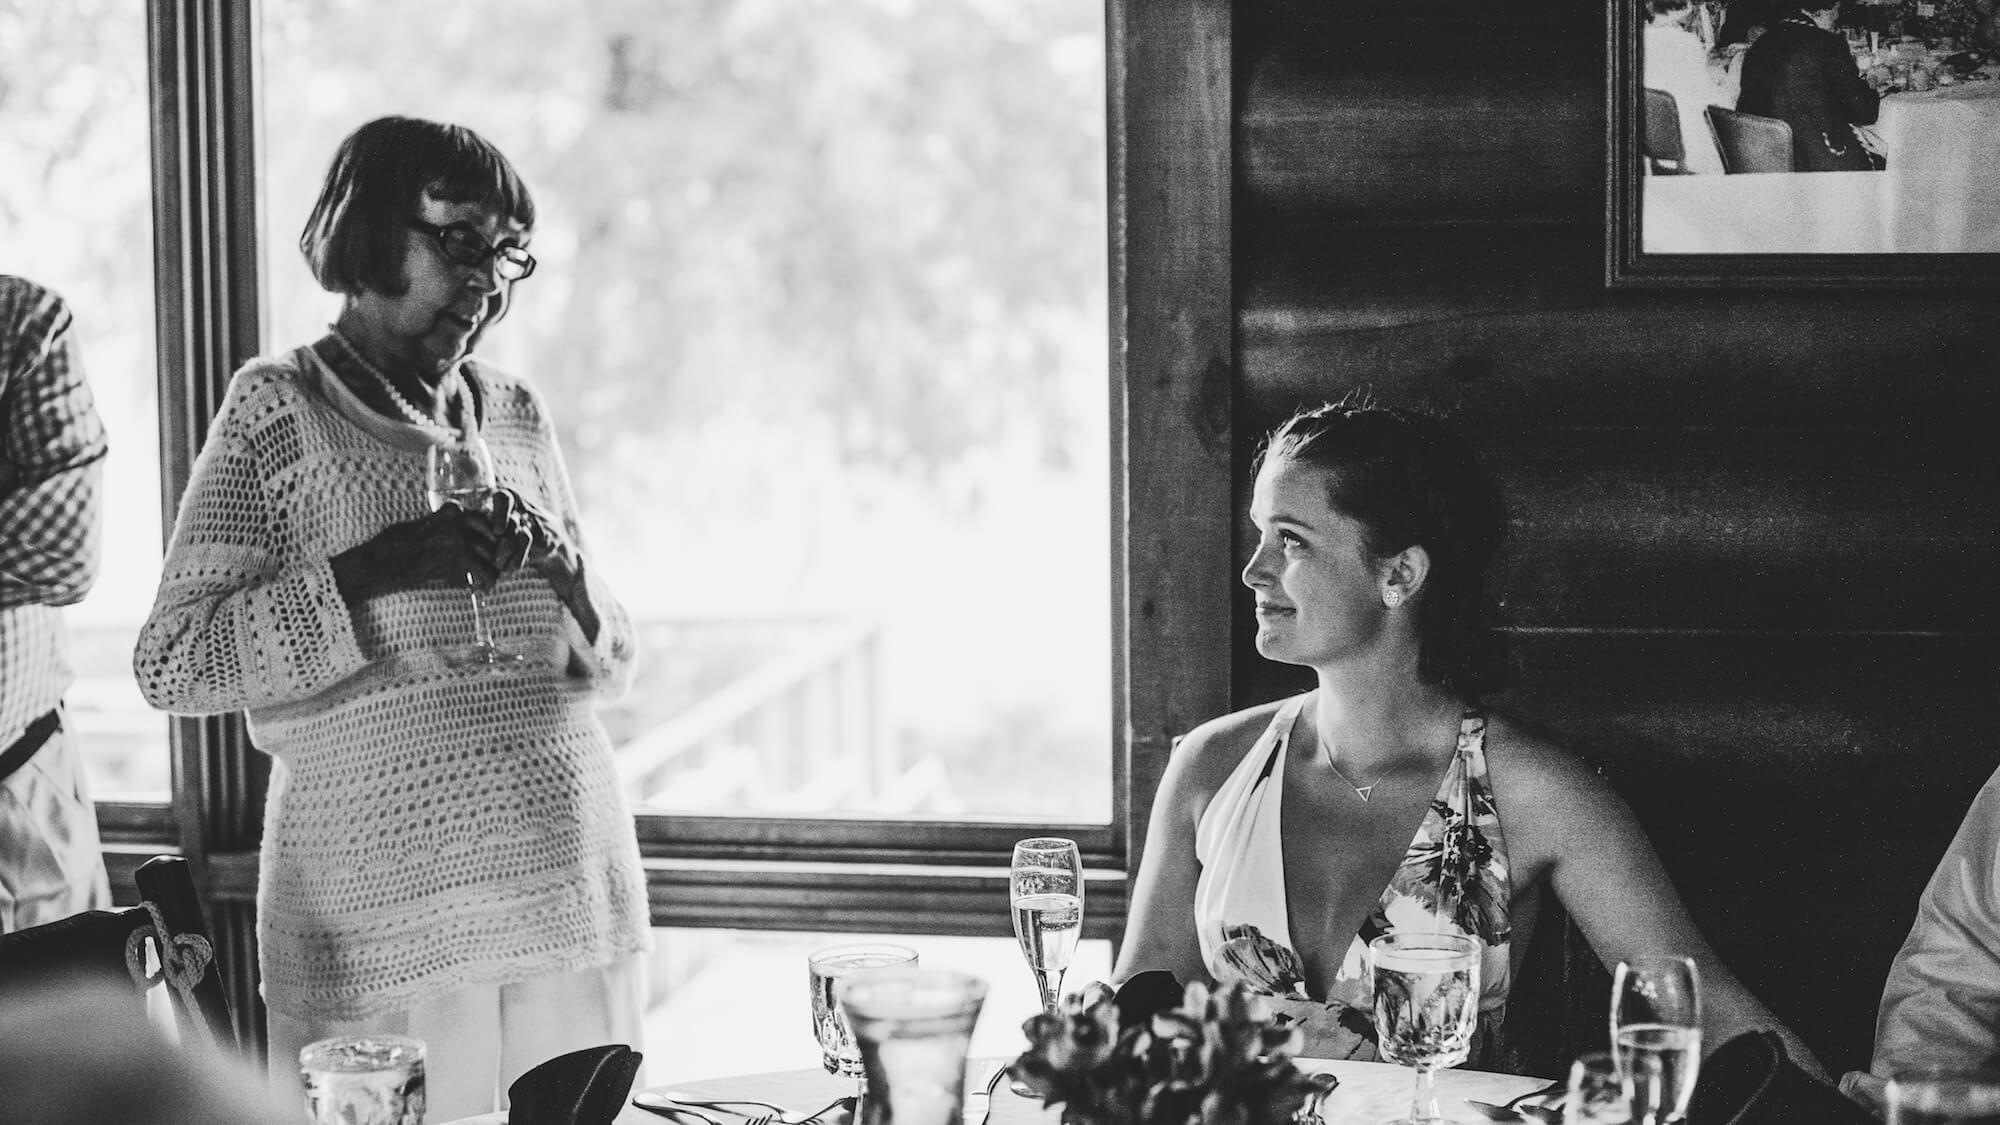 engle-olson-maddy-pat-mn-wedding-photography-28.jpg